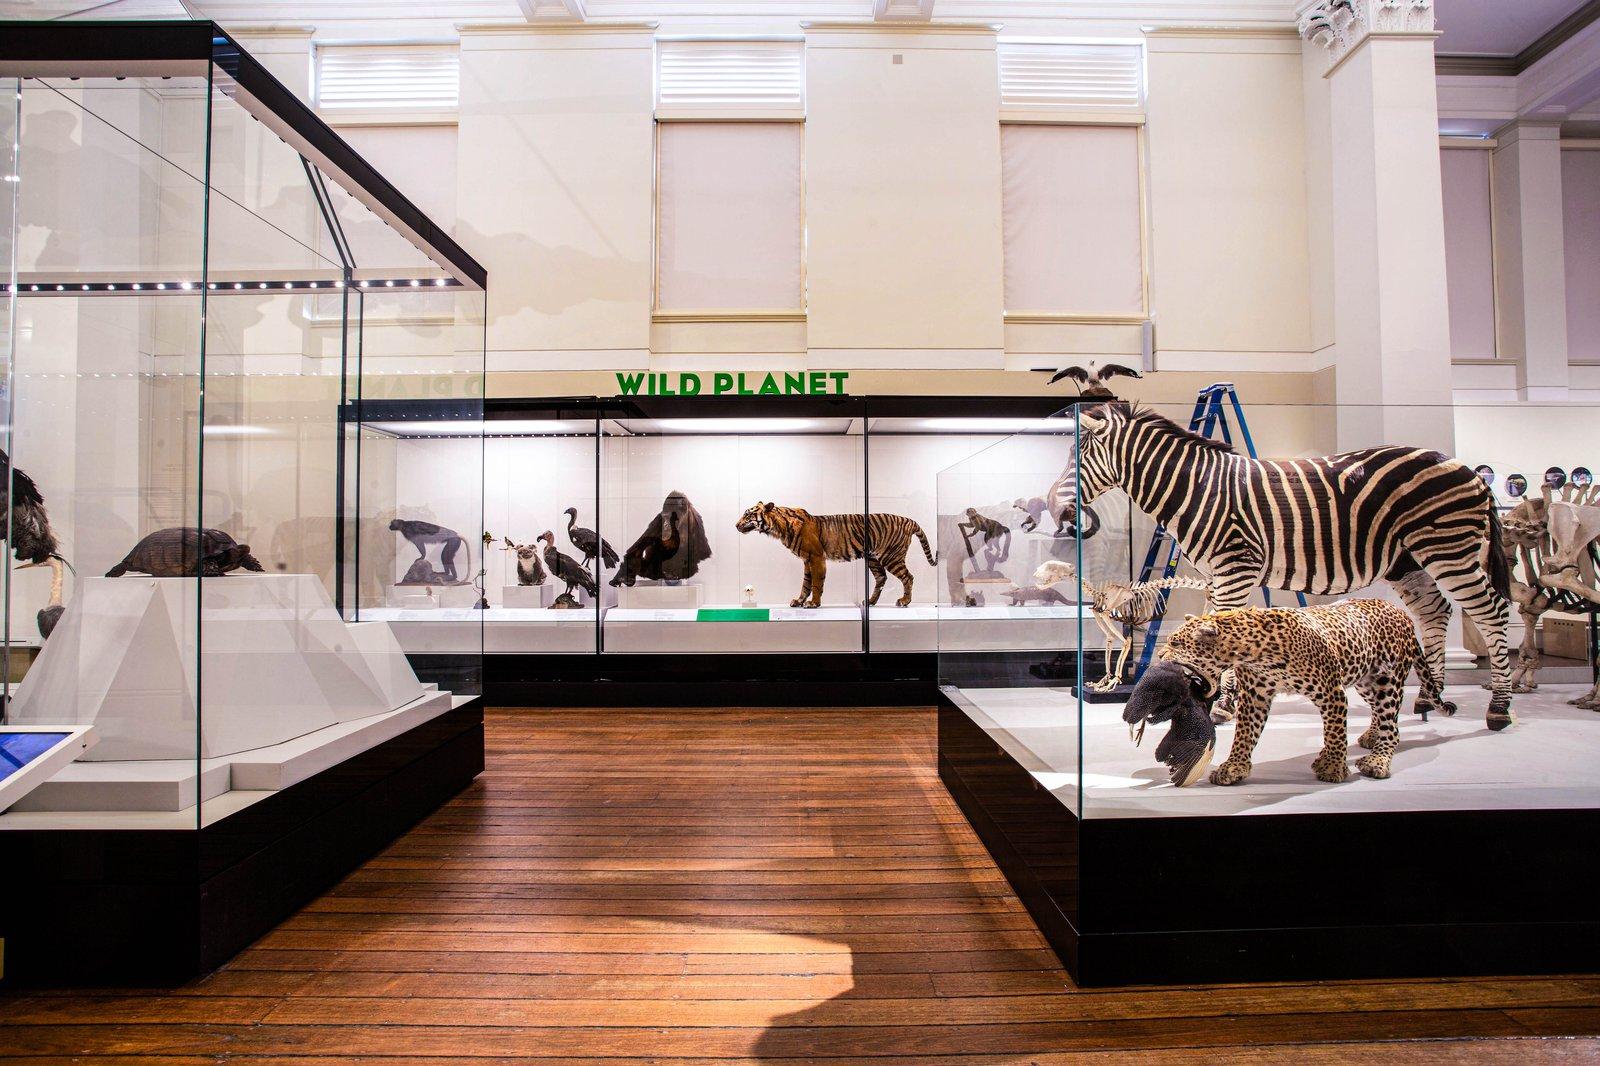 Wild Planet gallery